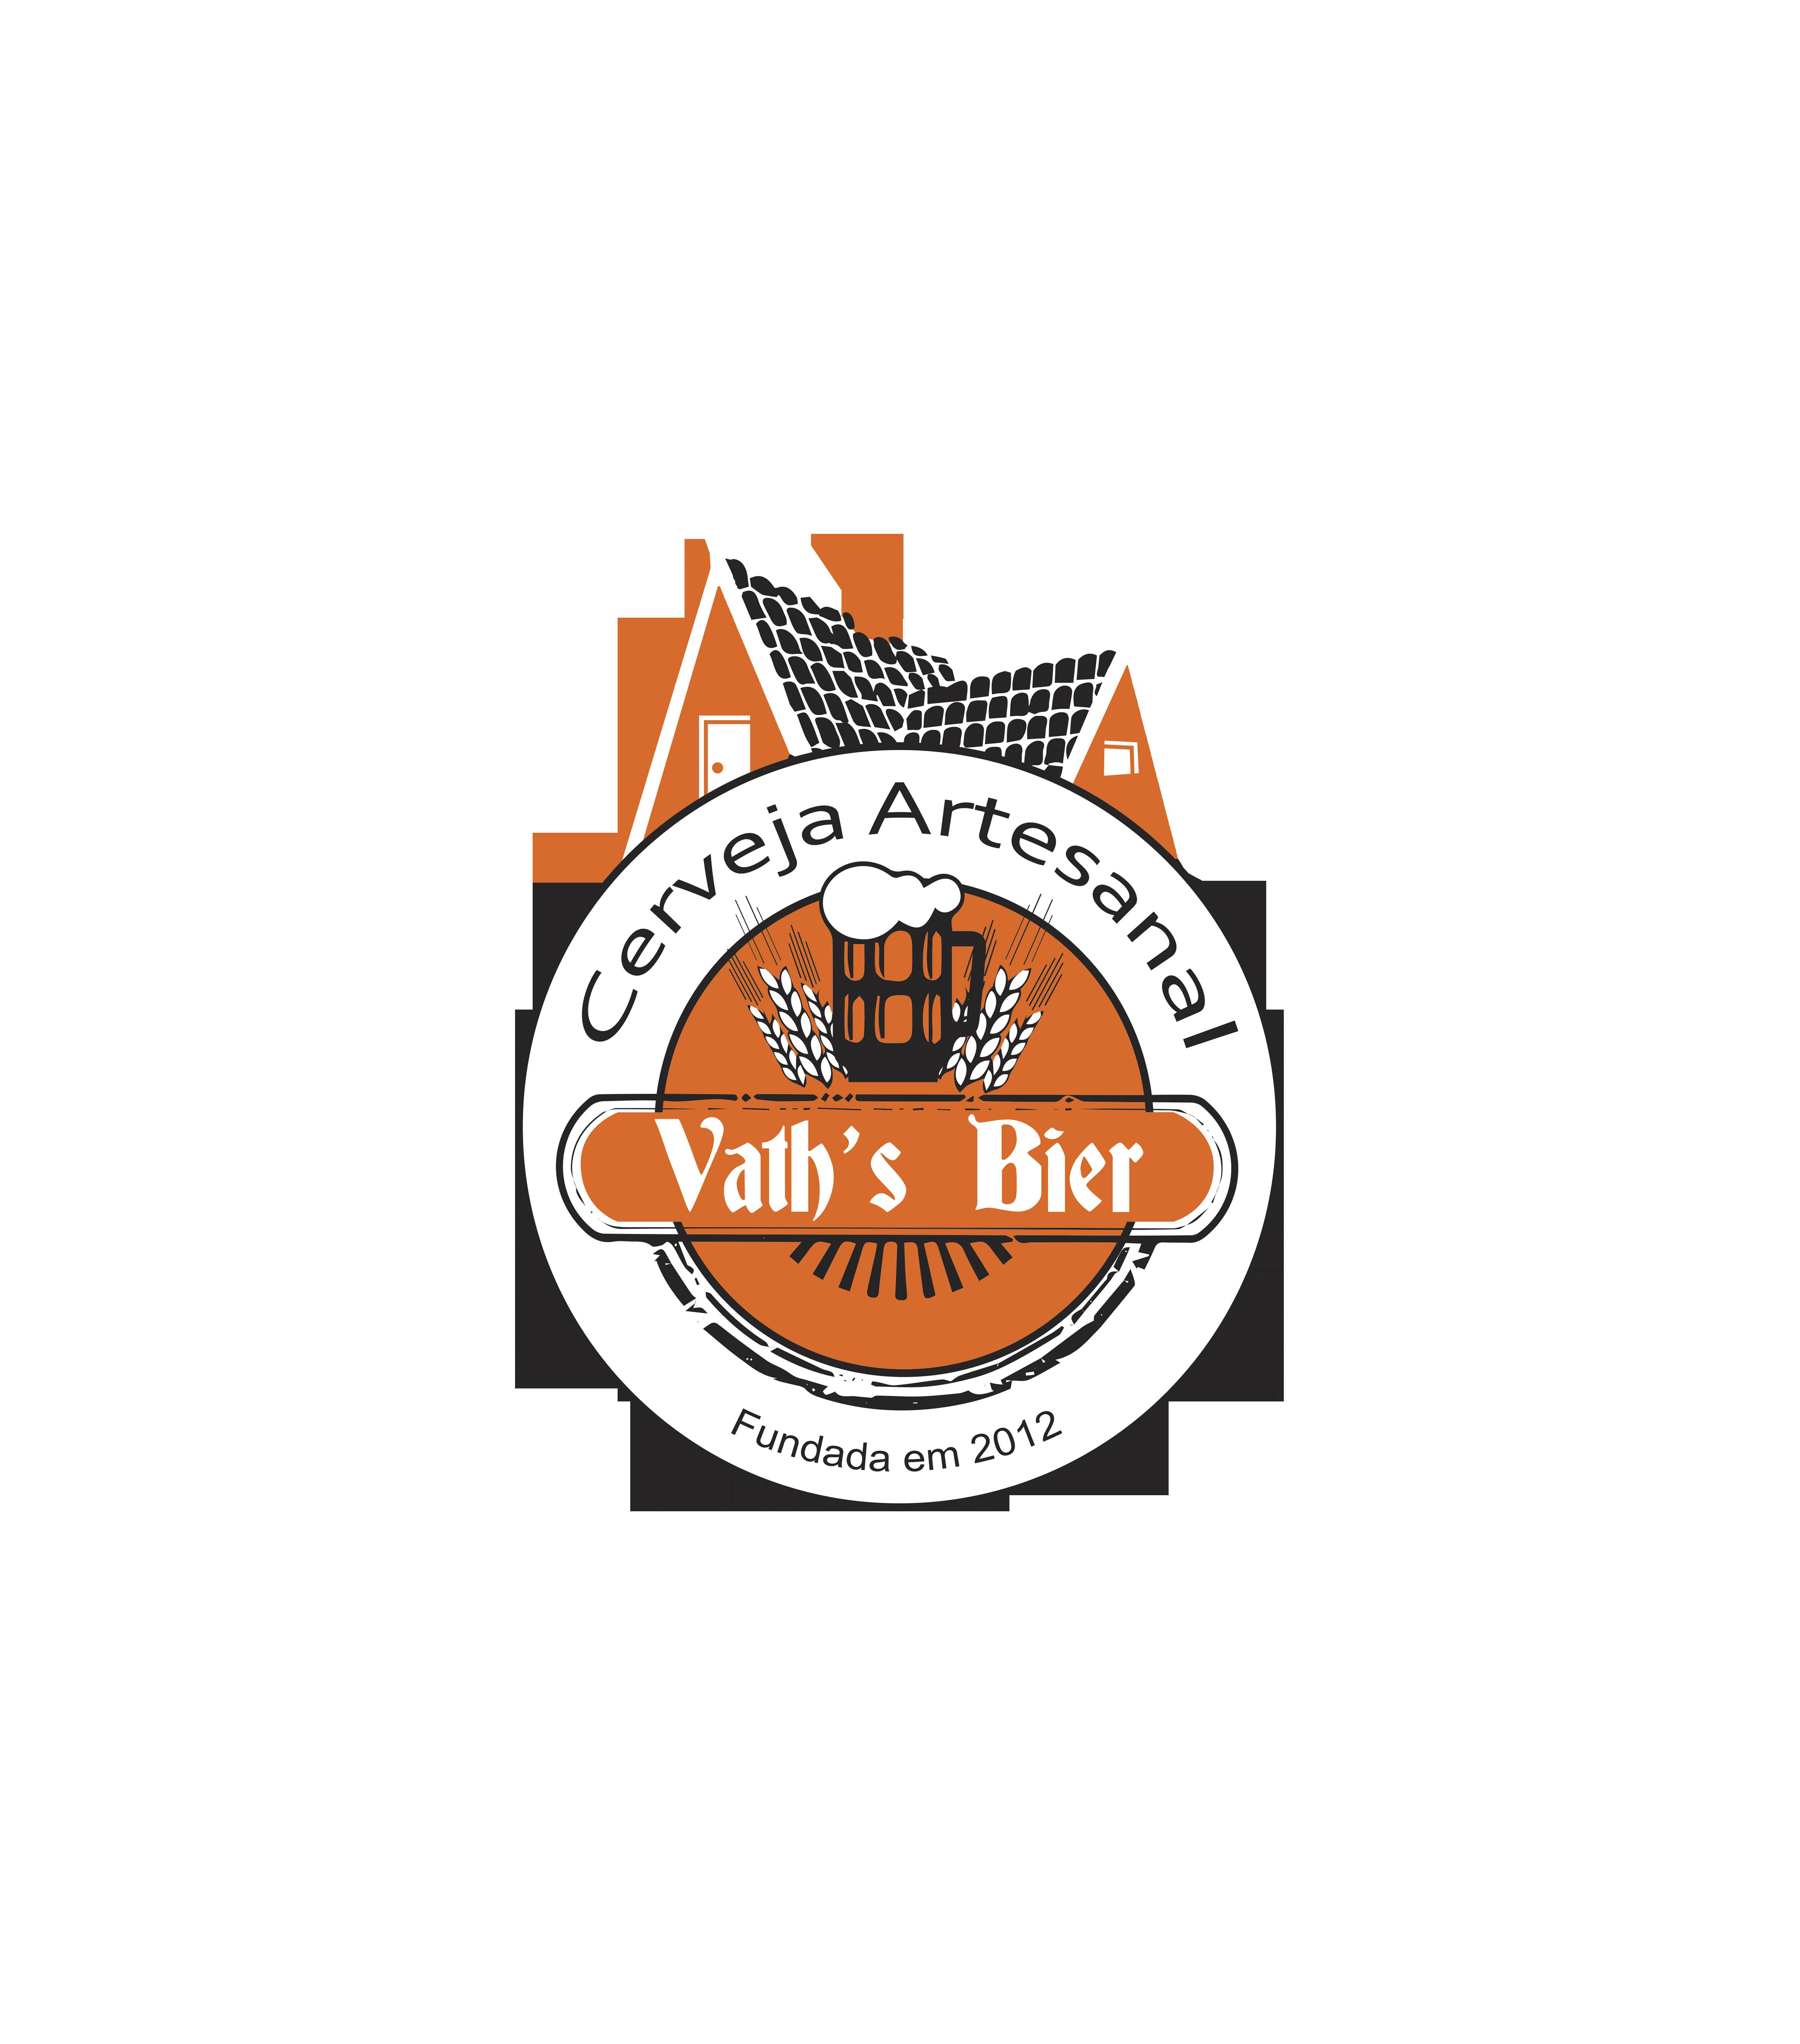 Logo Vath's Bier